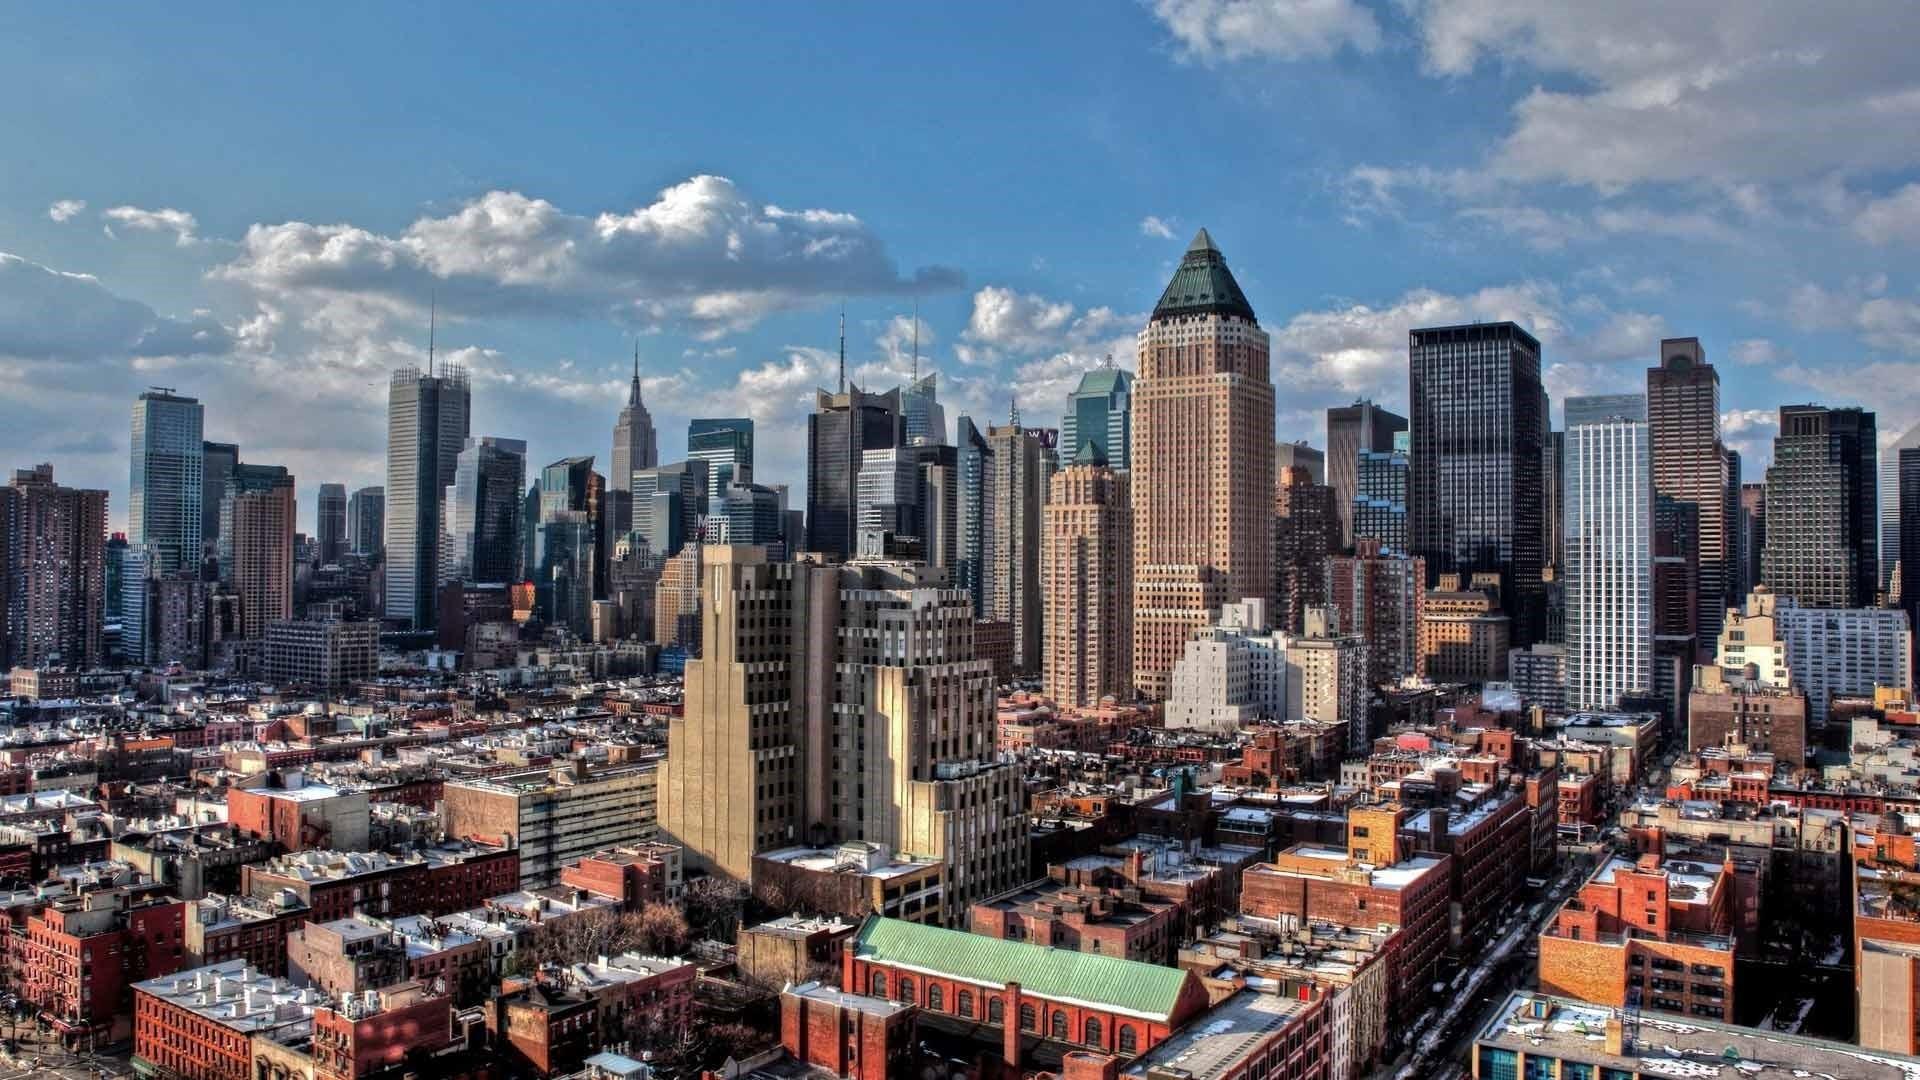 New York City Desktop Wallpaper